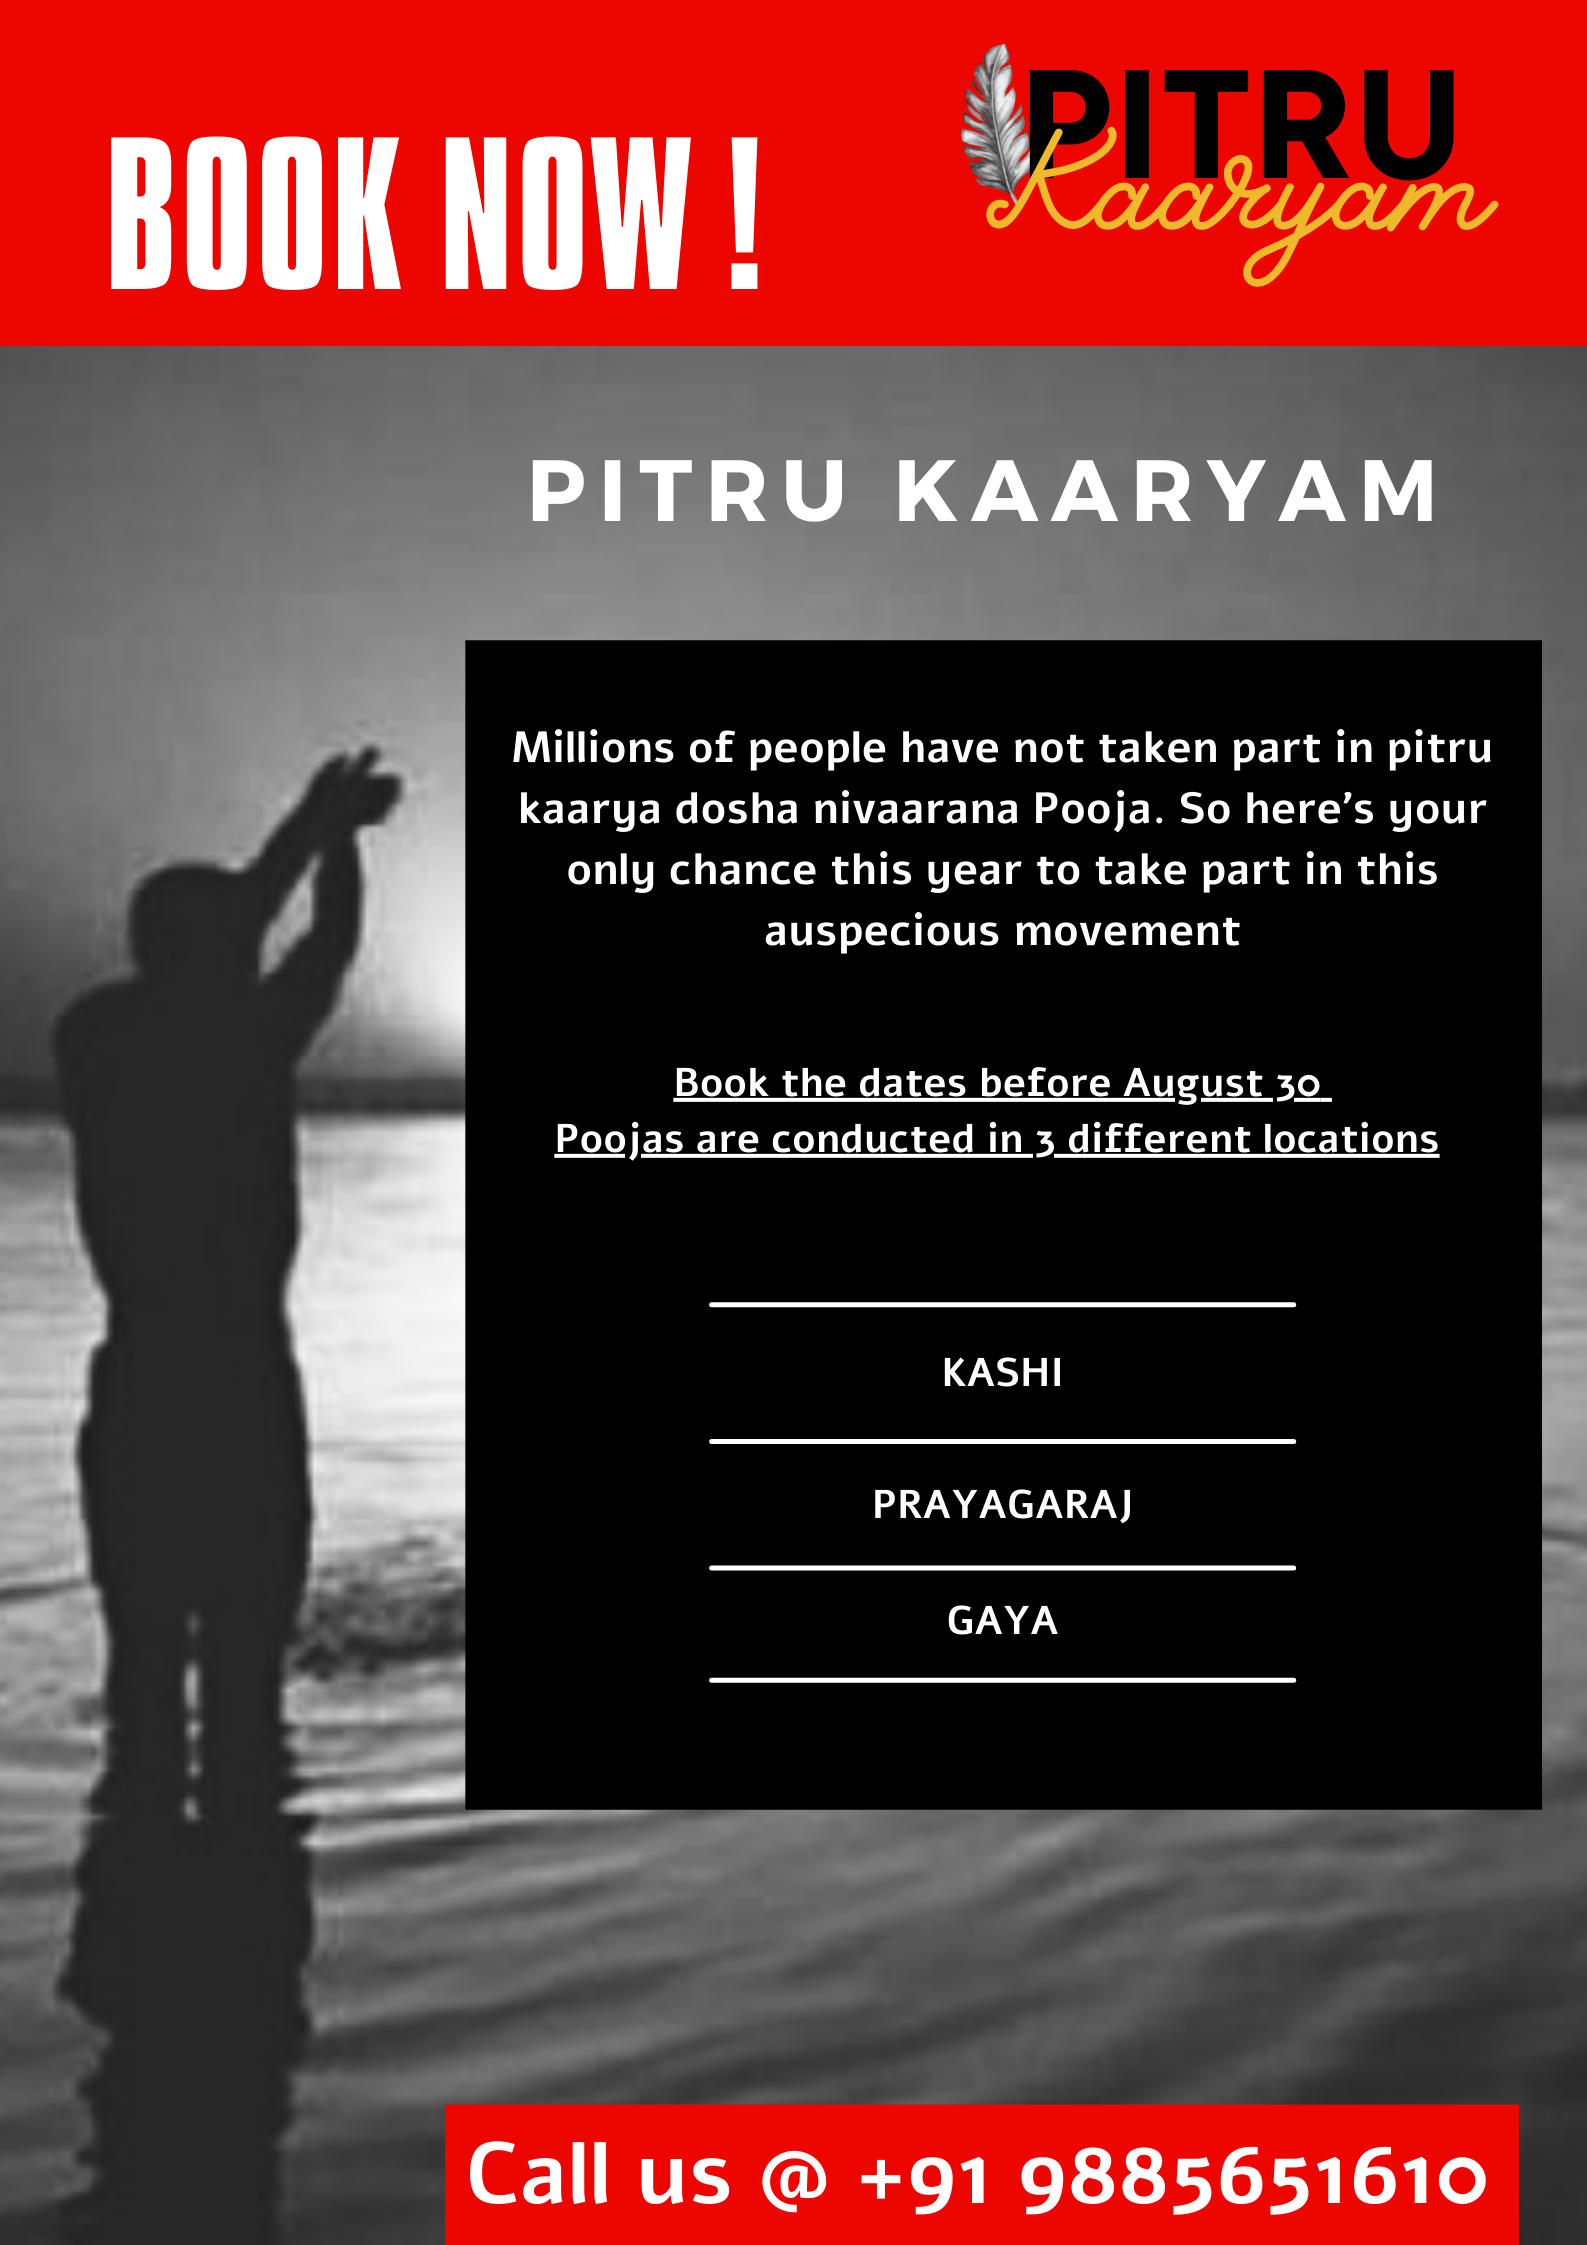 PitruKaaryam 6